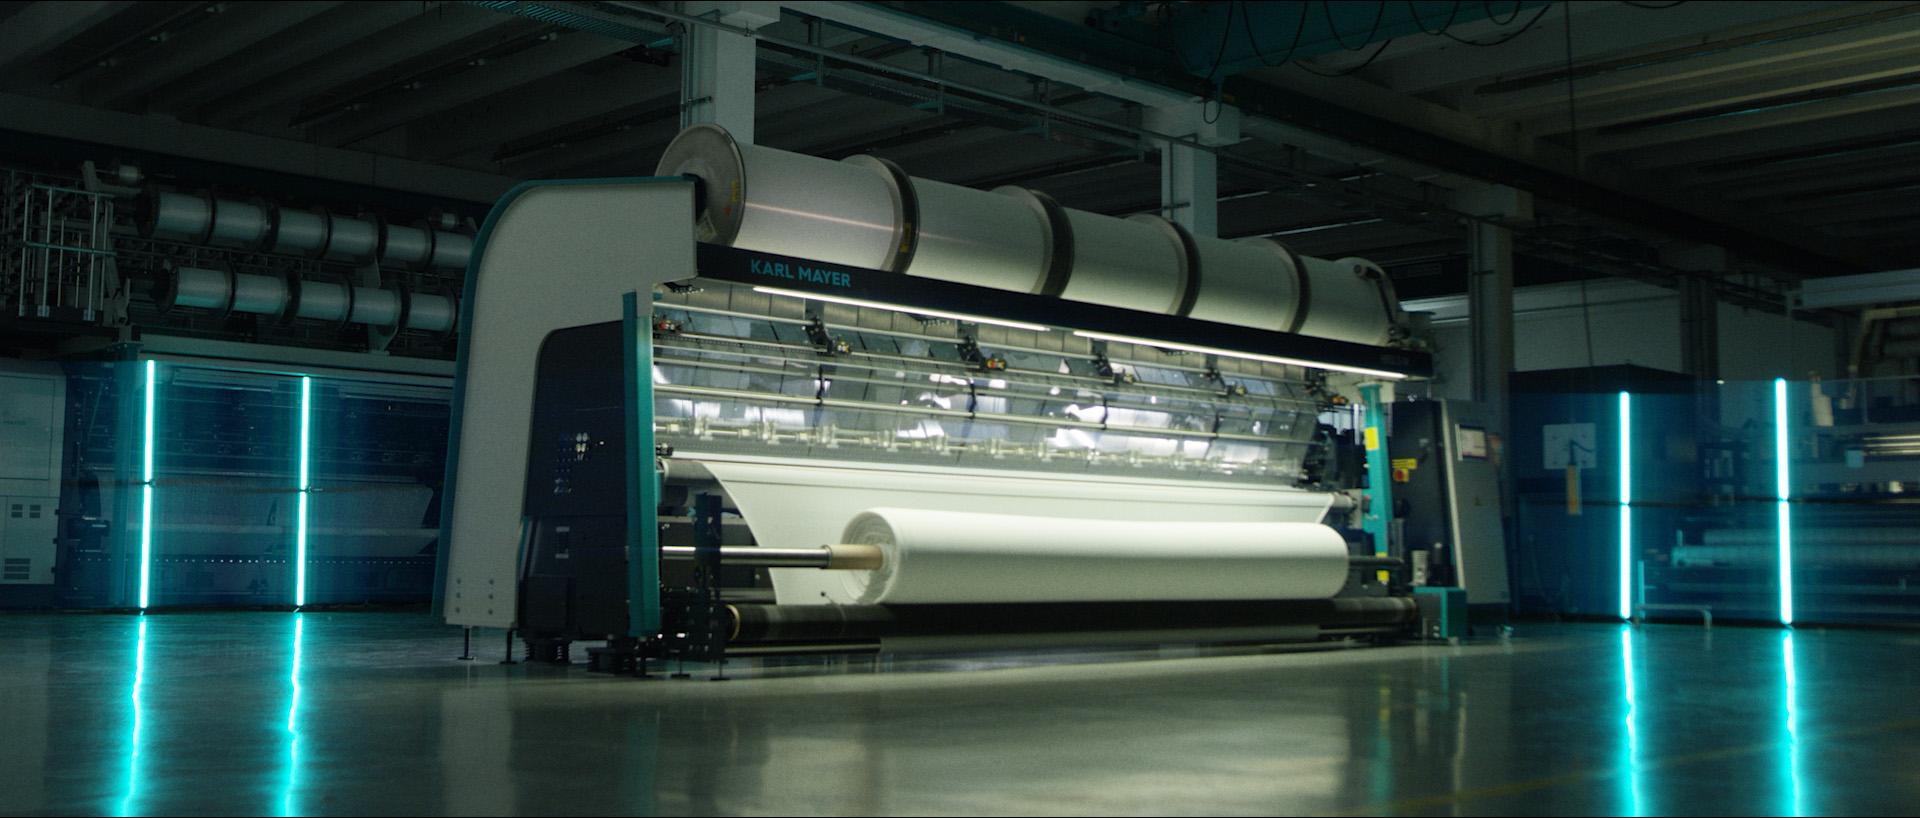 Karl-Mayer-Texture-Machine-Production-Textile_08.jpg